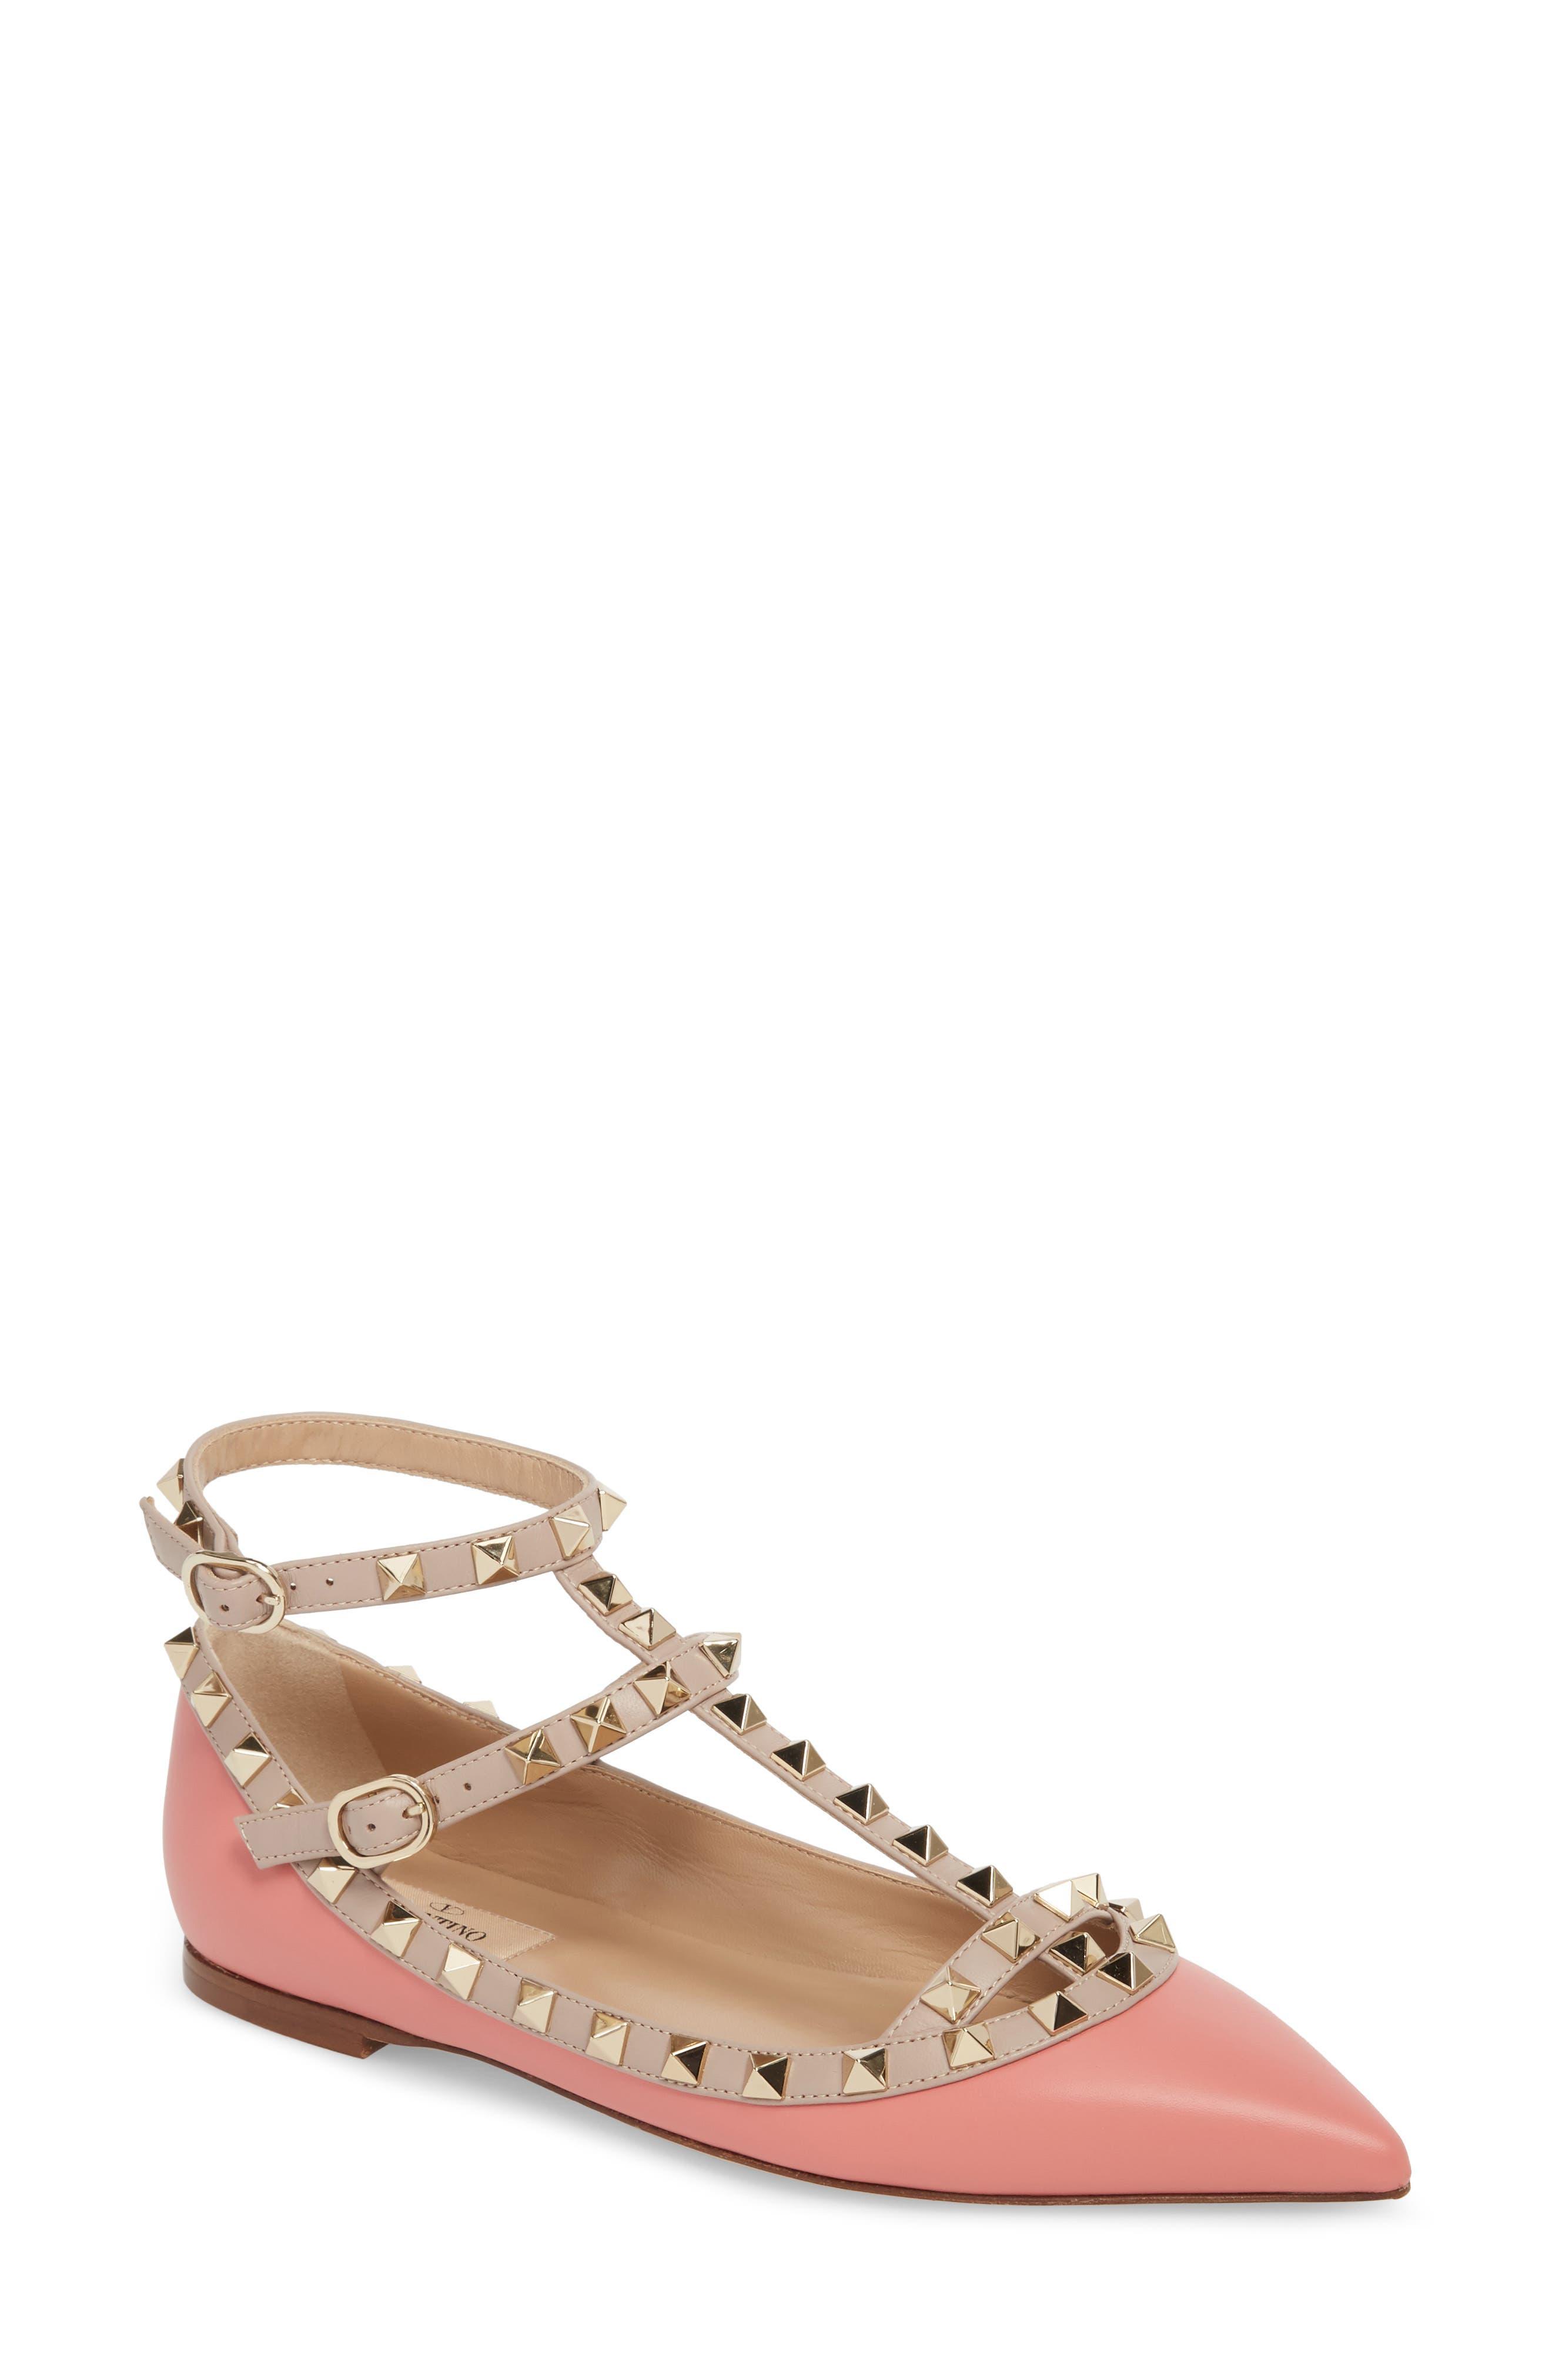 Valentino Women's Rockstud Ankle Strap Pointy Toe Flat 6gb8JFuk